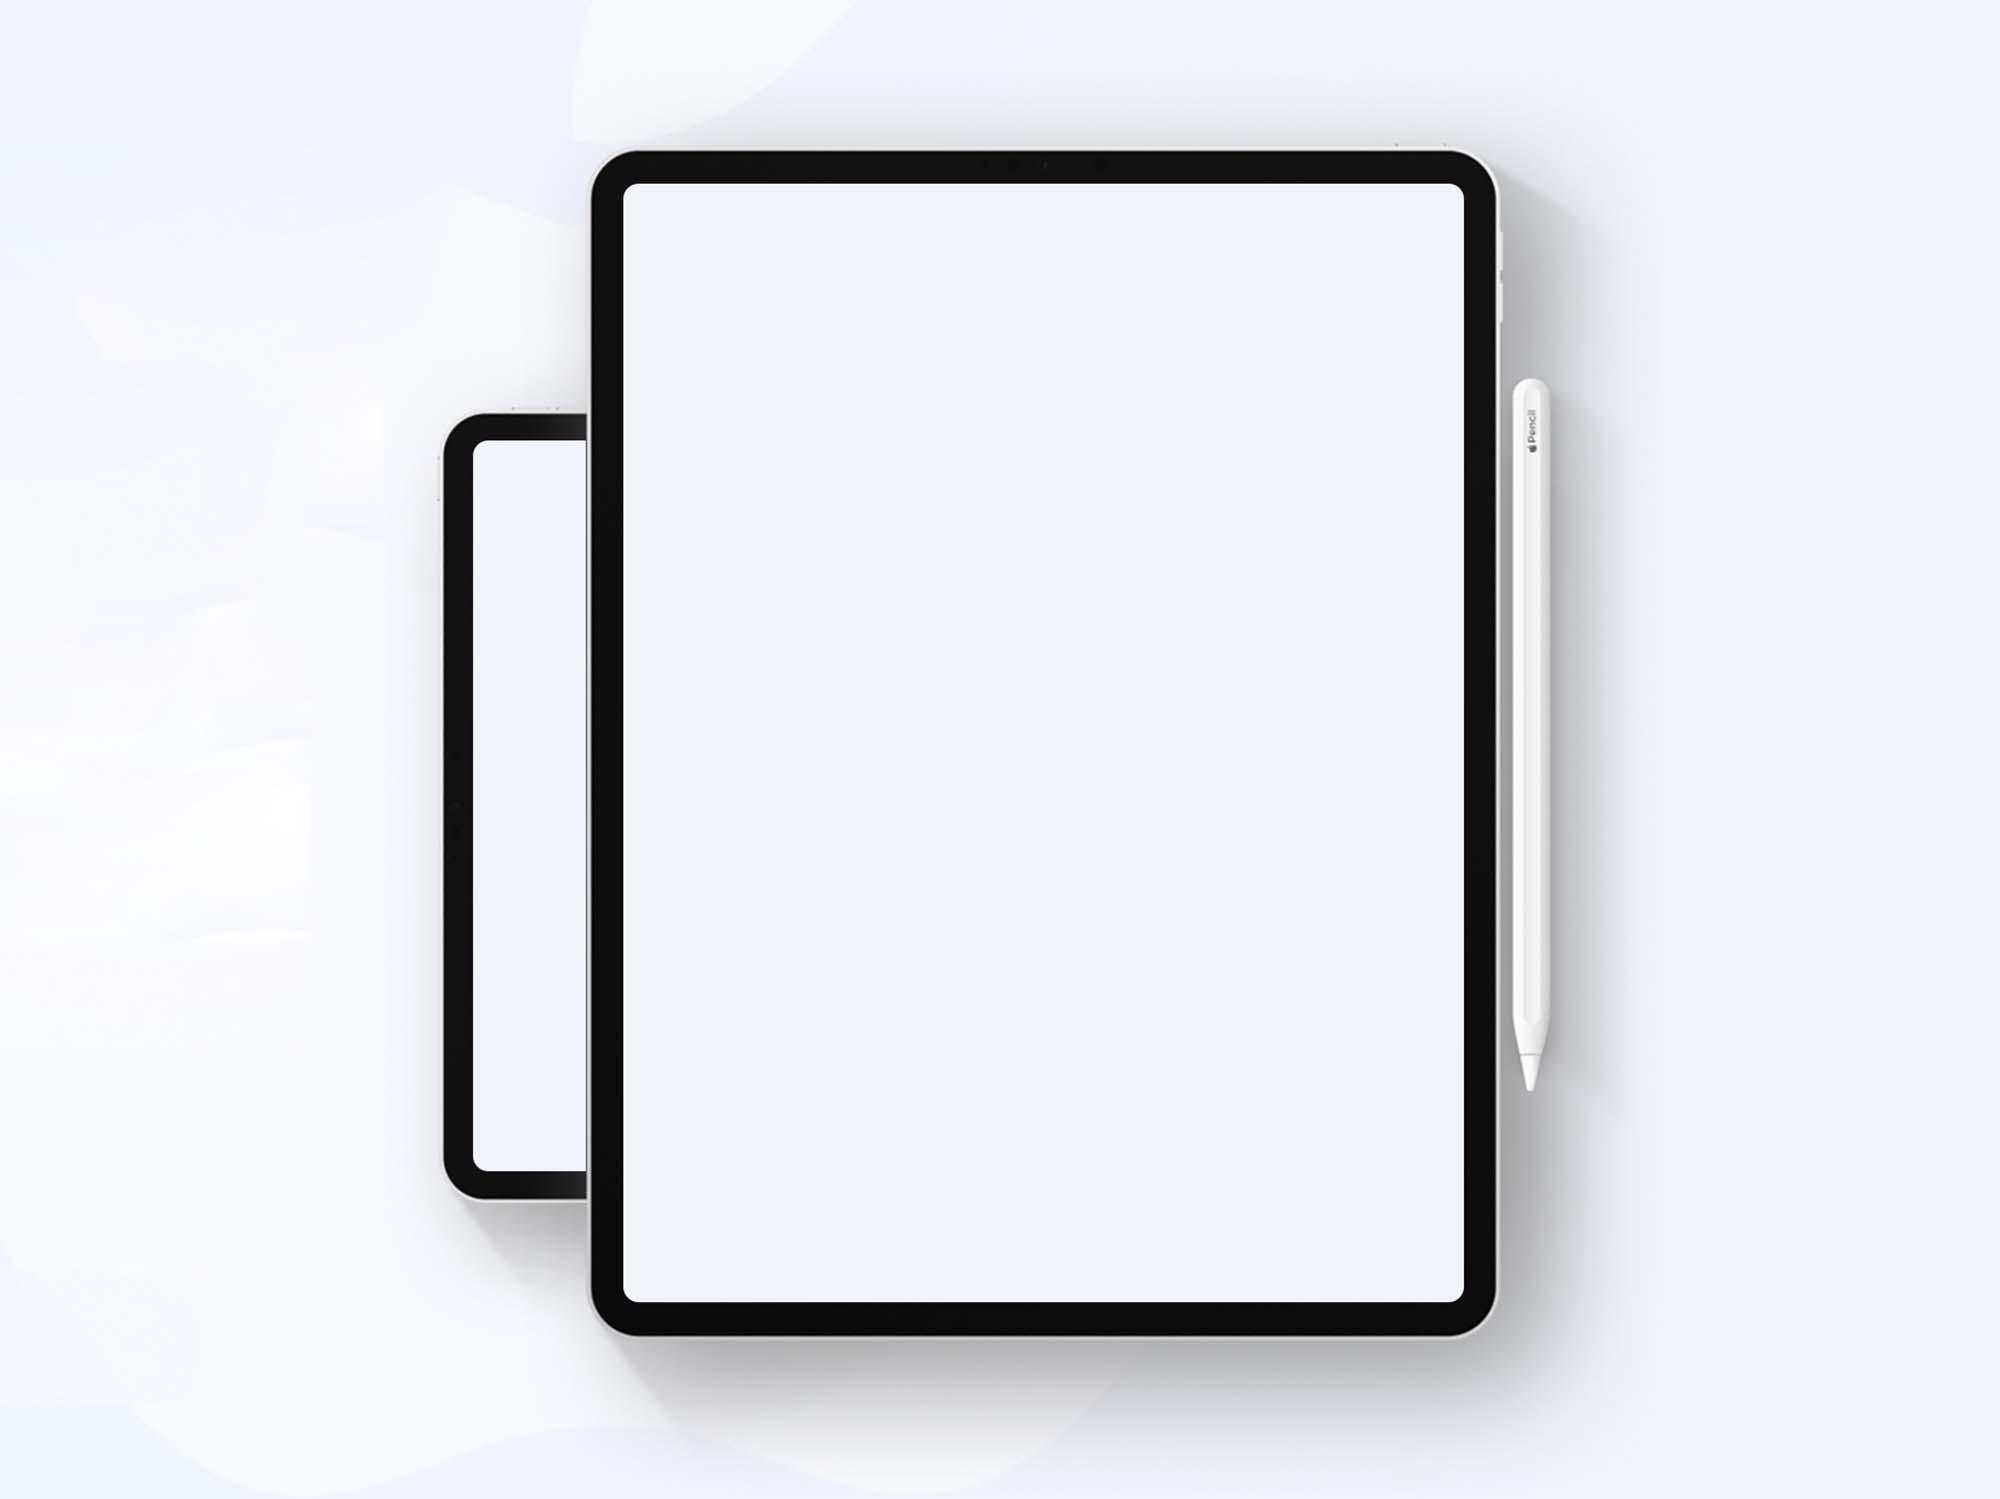 iPad Pro Figma Mockup 2